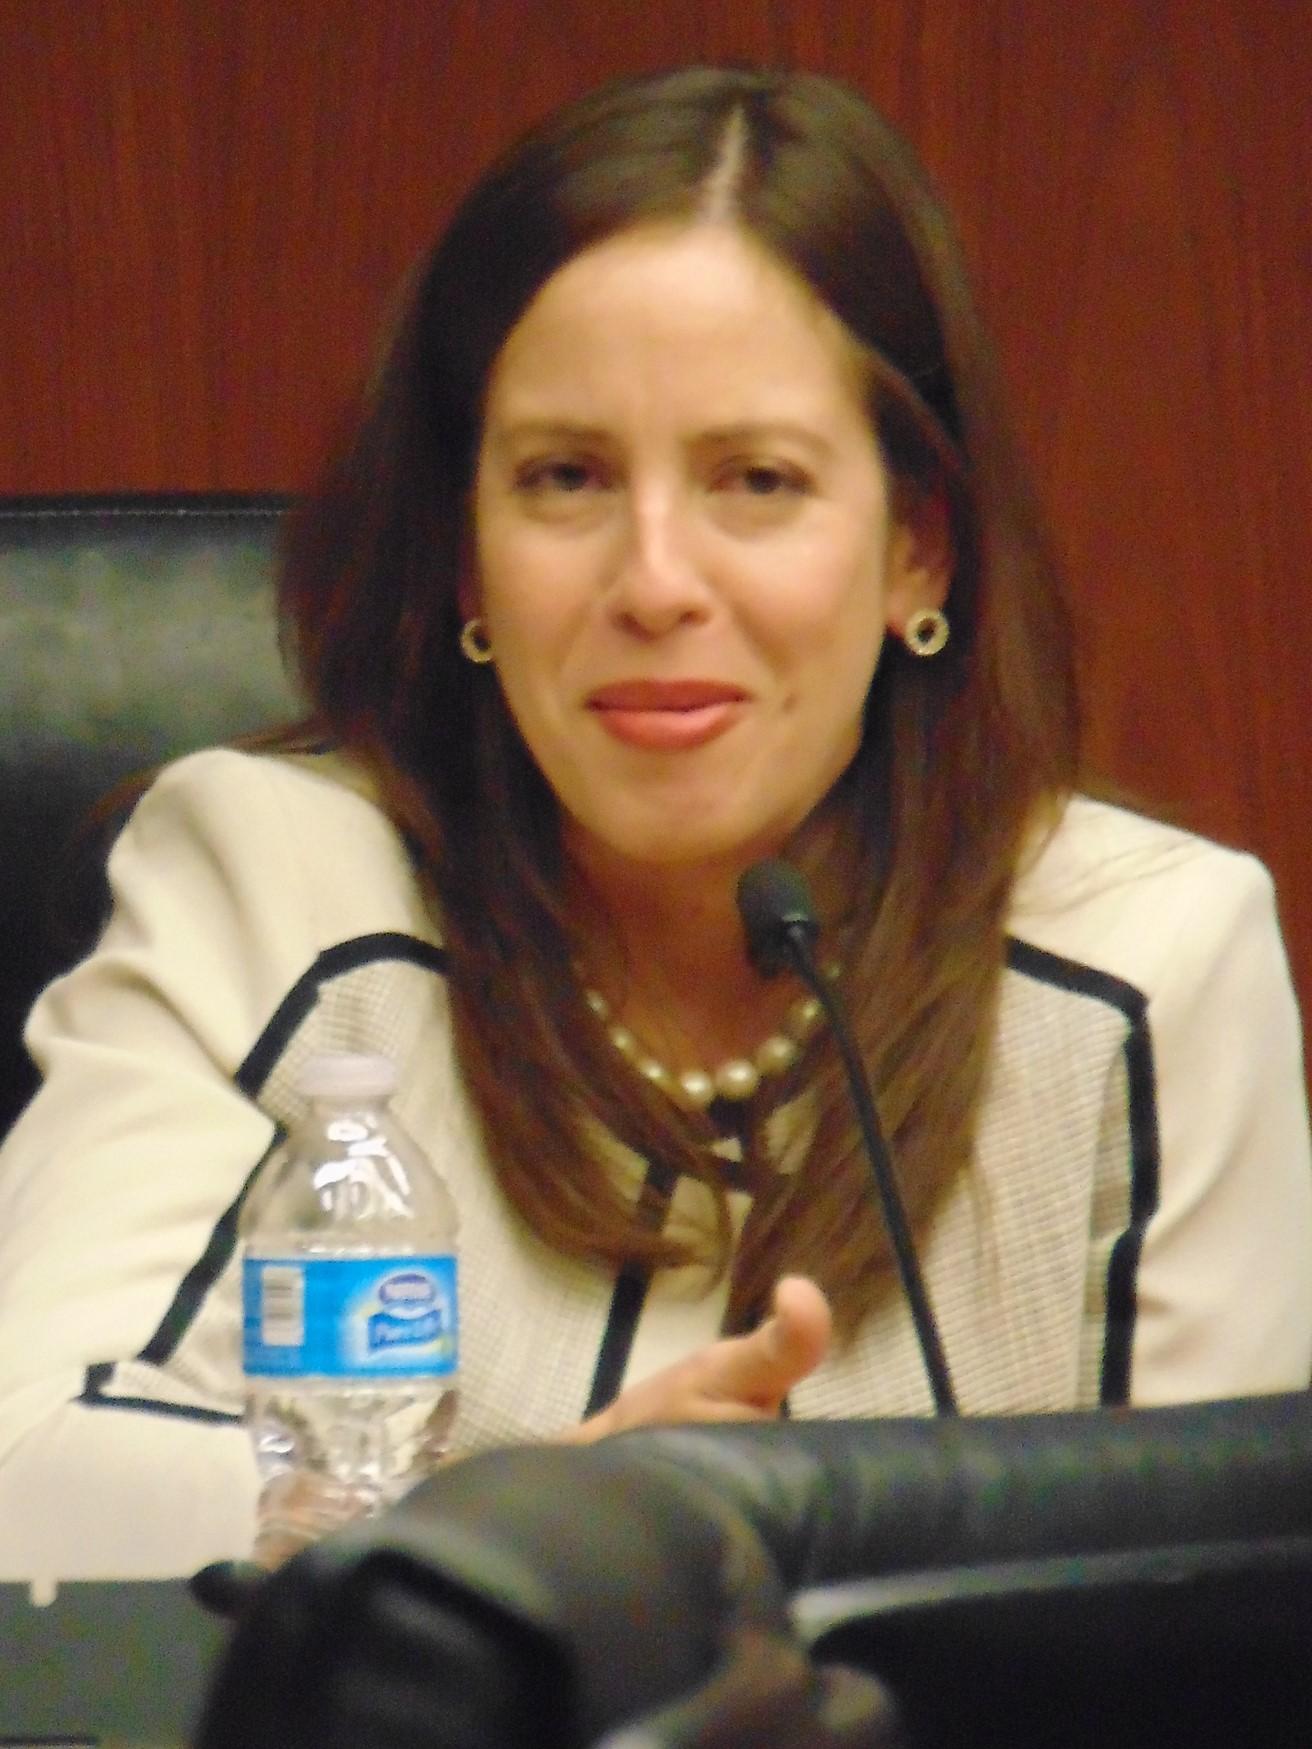 Women Lawmakers Of Color Caucus At Capitol MN Spokesman